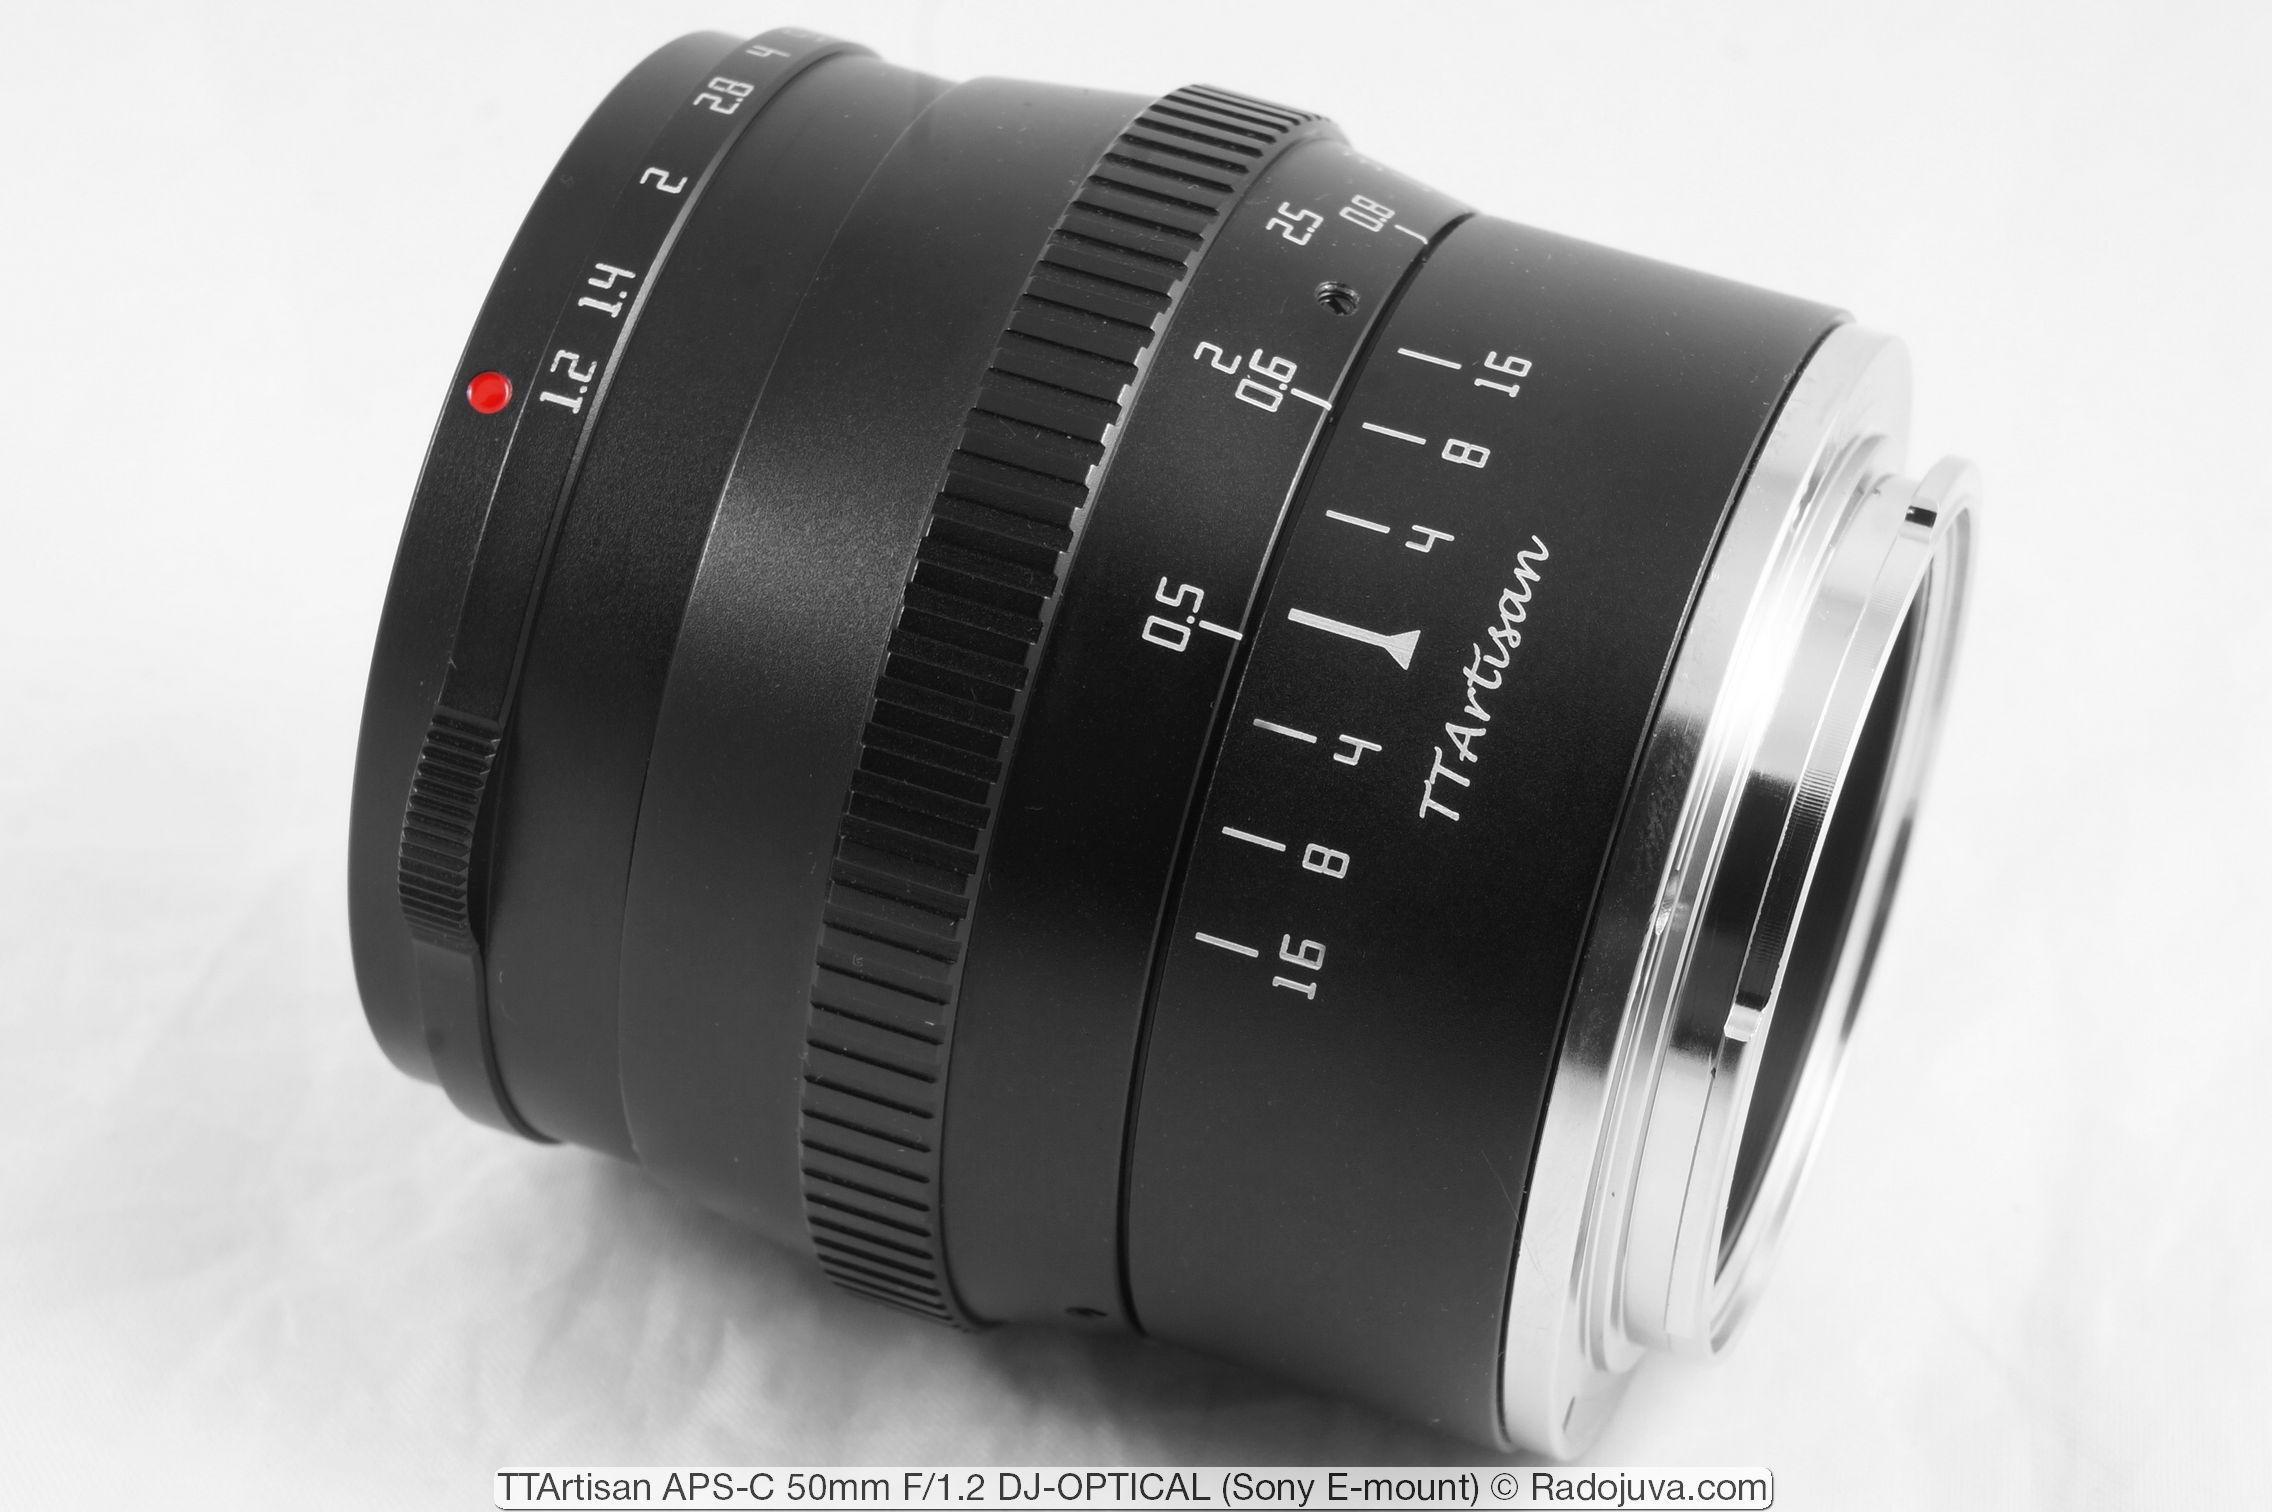 TTArtisan APS-C 50mm F/1.2 DJ-OPTICAL